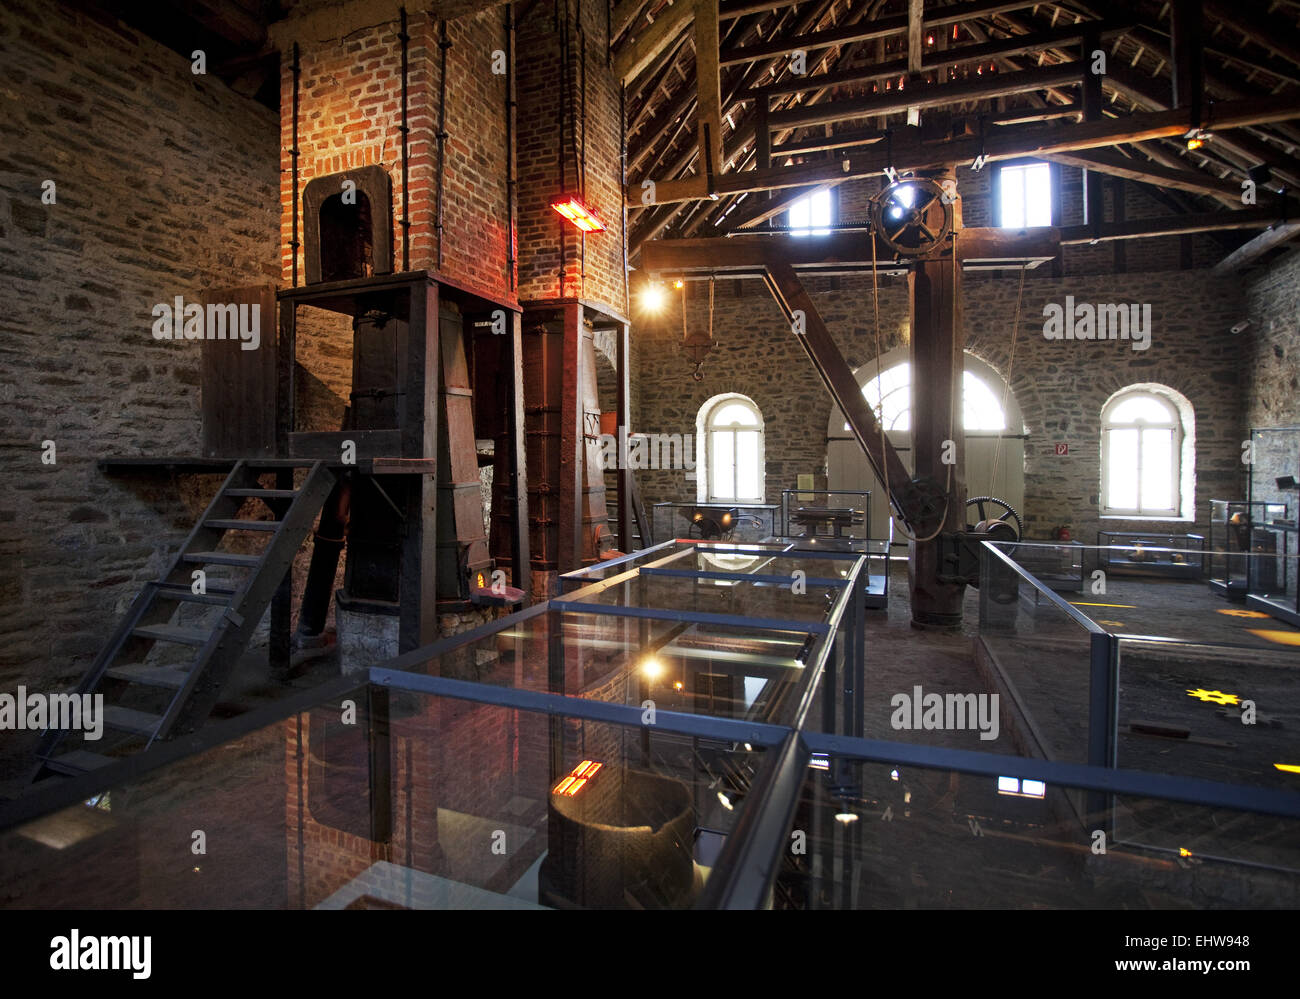 Das Museum Luisenhuette Wocklum in Balve Stockbild